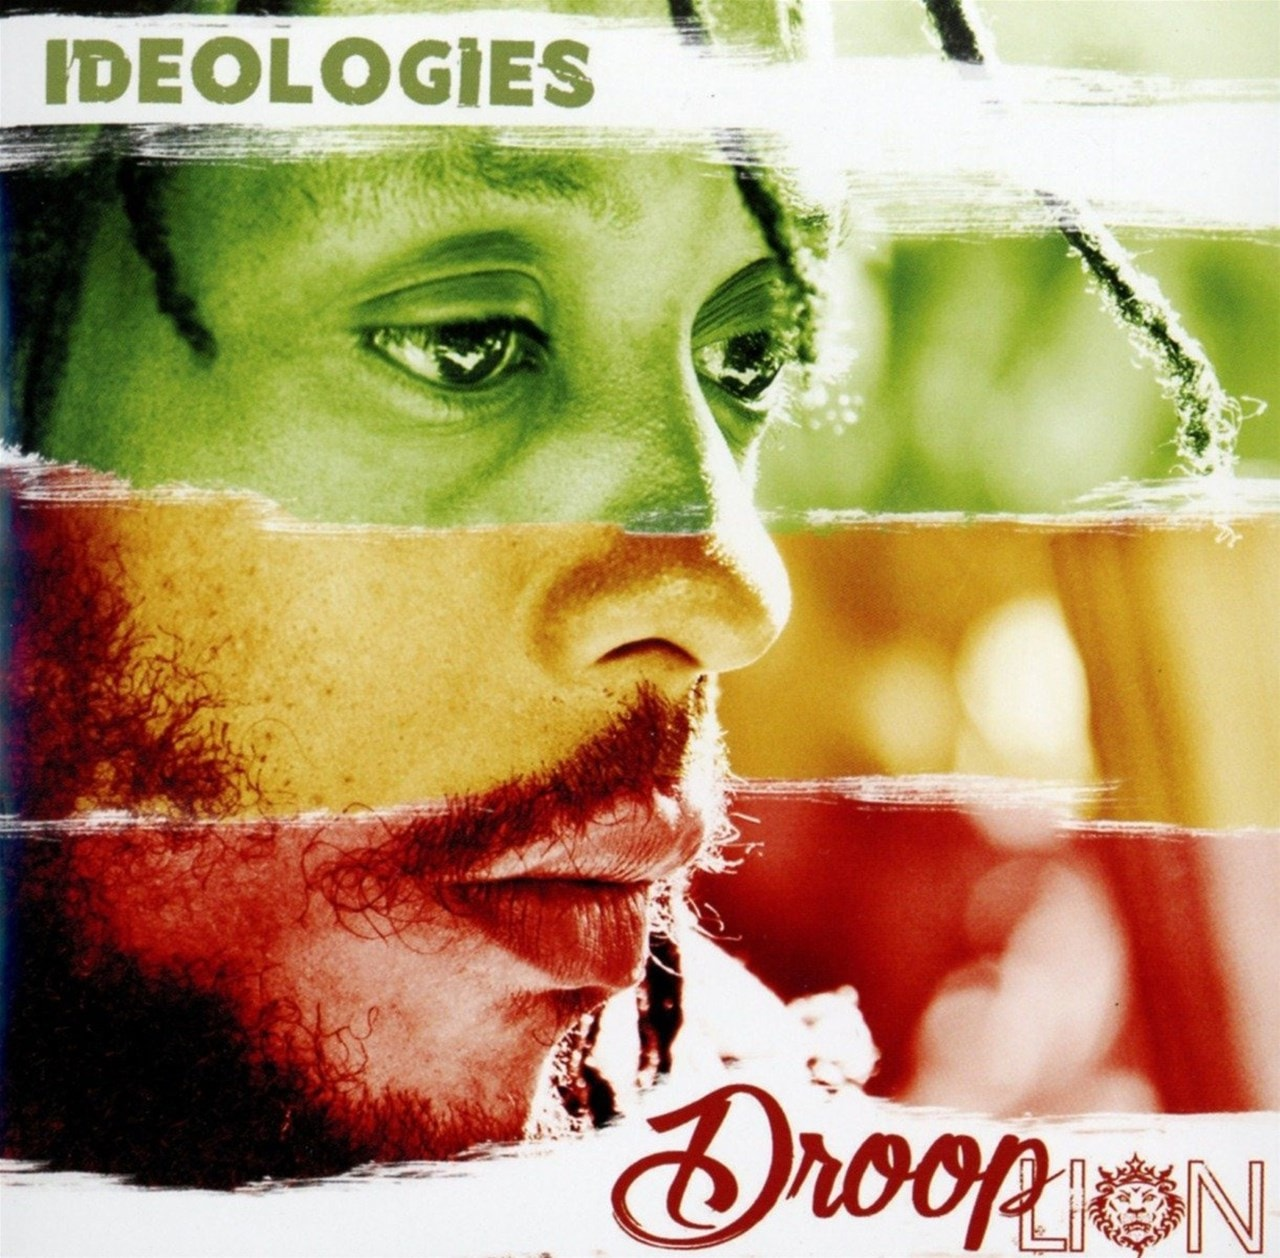 Ideologies - 1